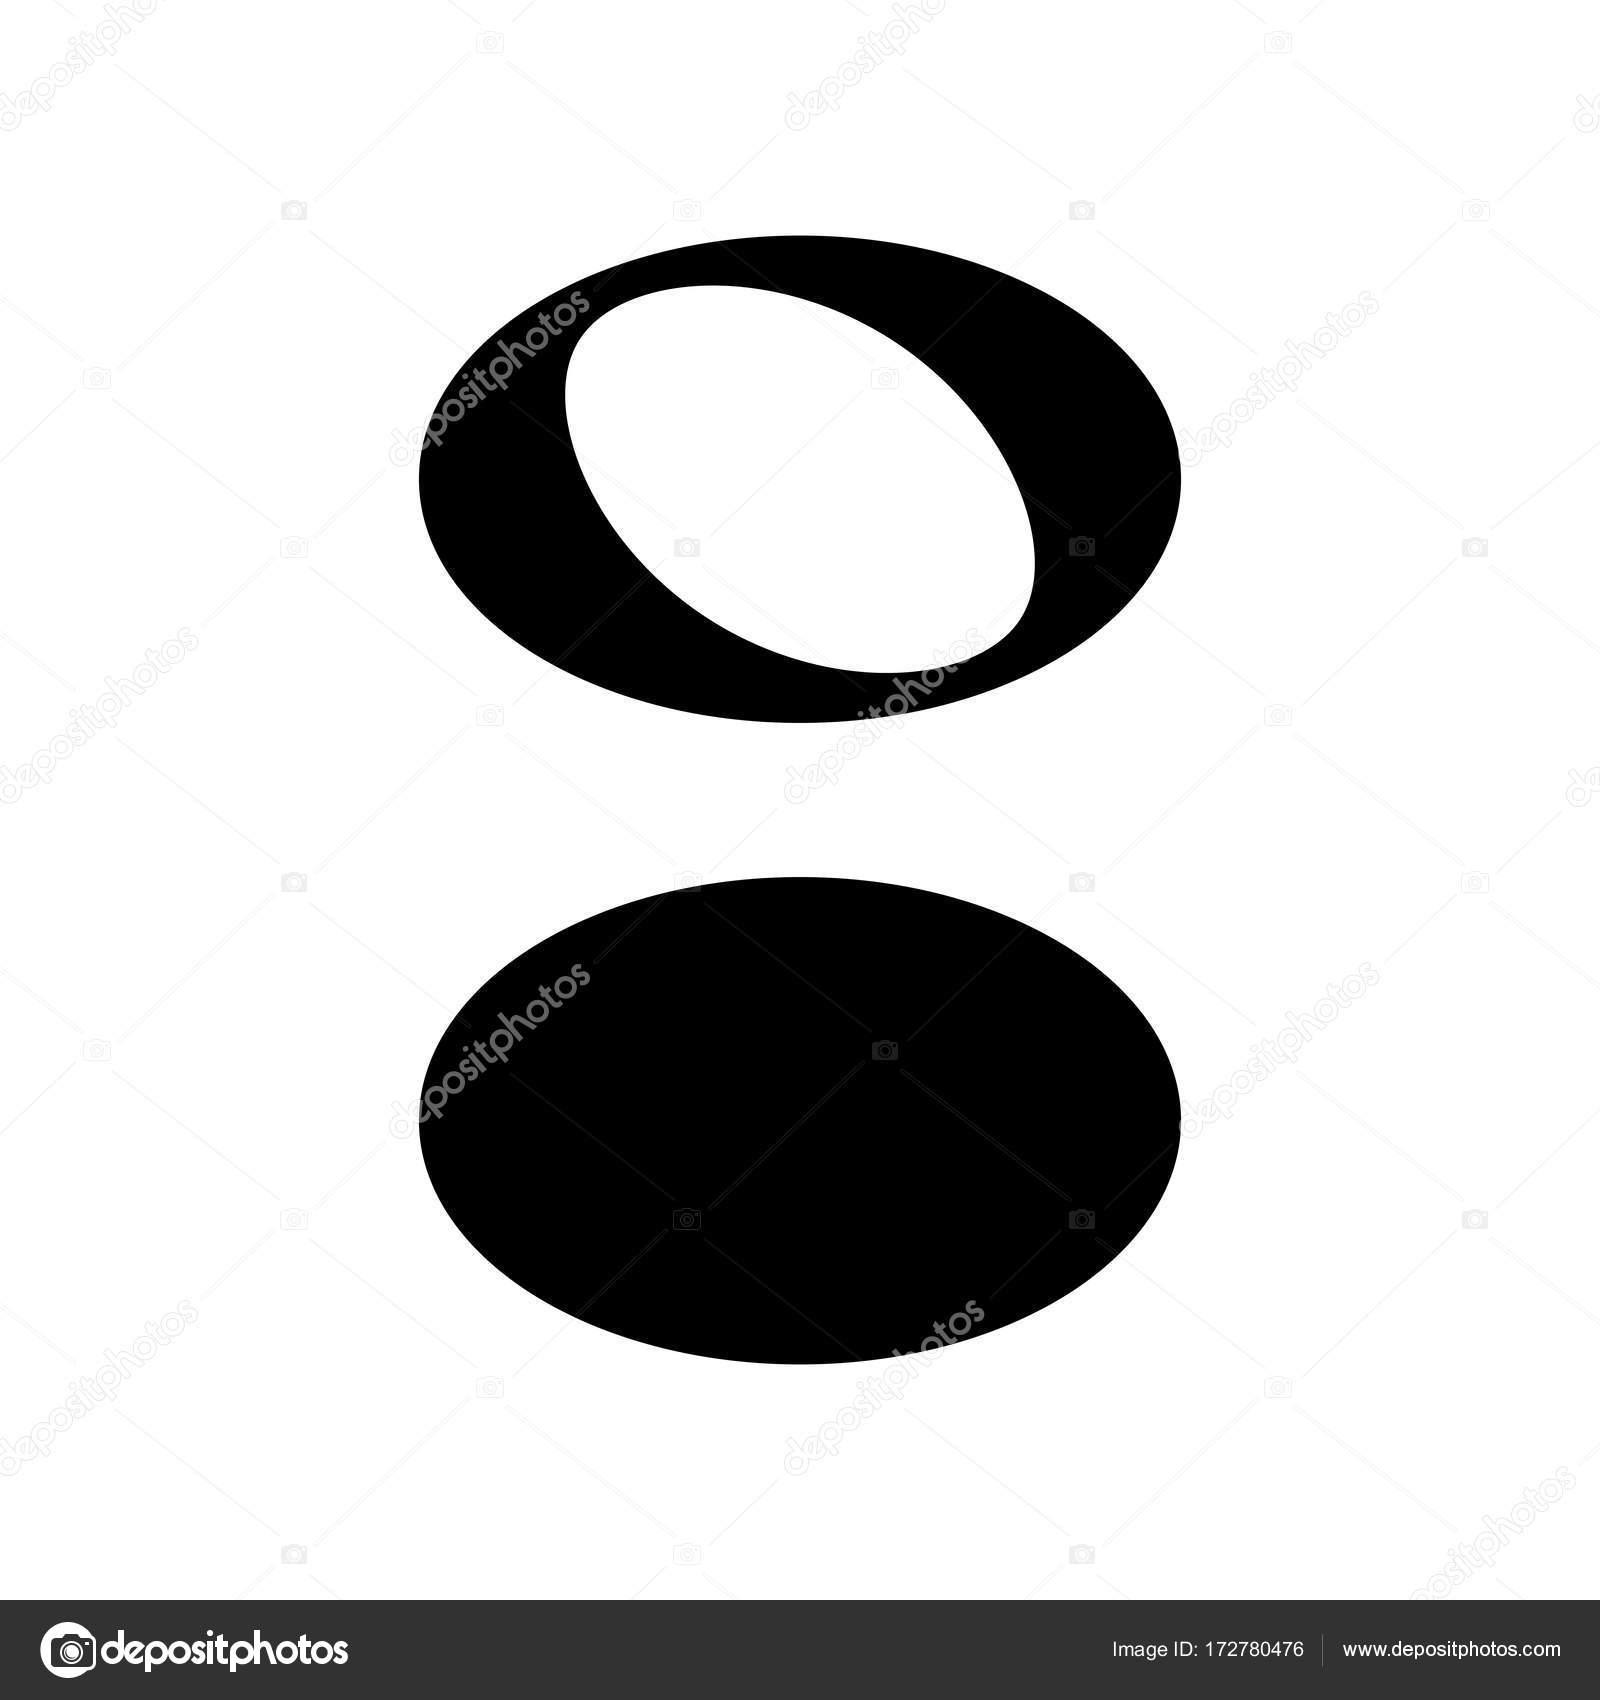 Isolated musical note stock vector jokalar01 172780476 isolated musical note whole and quarter note vector illustration vector by jokalar01 biocorpaavc Gallery